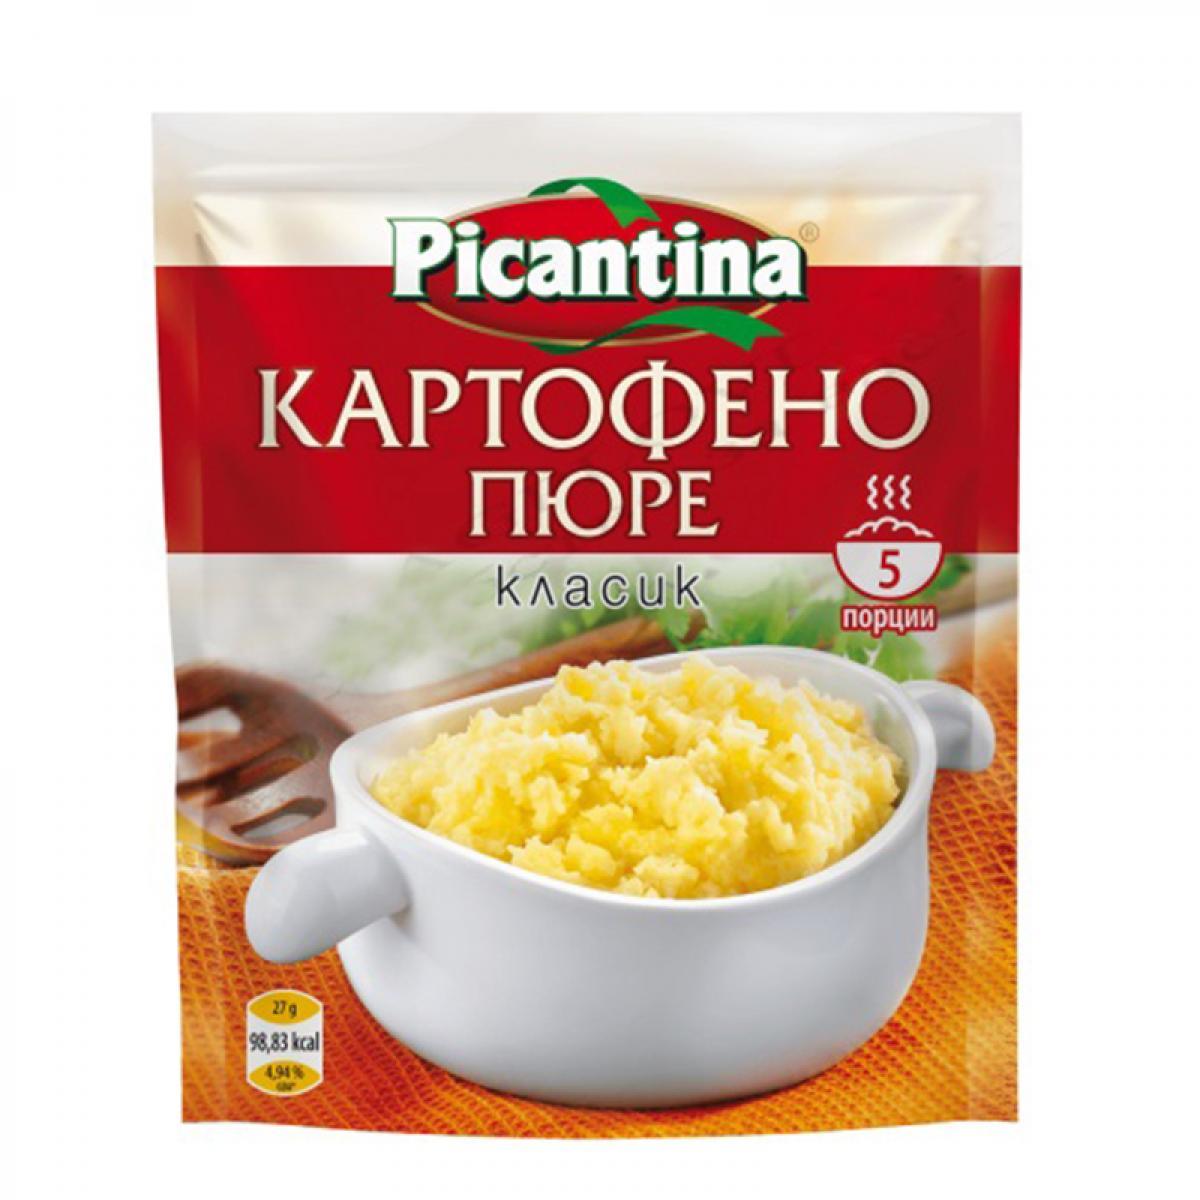 ПИКАНТИНА КАРТОФЕНО ПЮРЕ 135Г НАТУРАЛНО